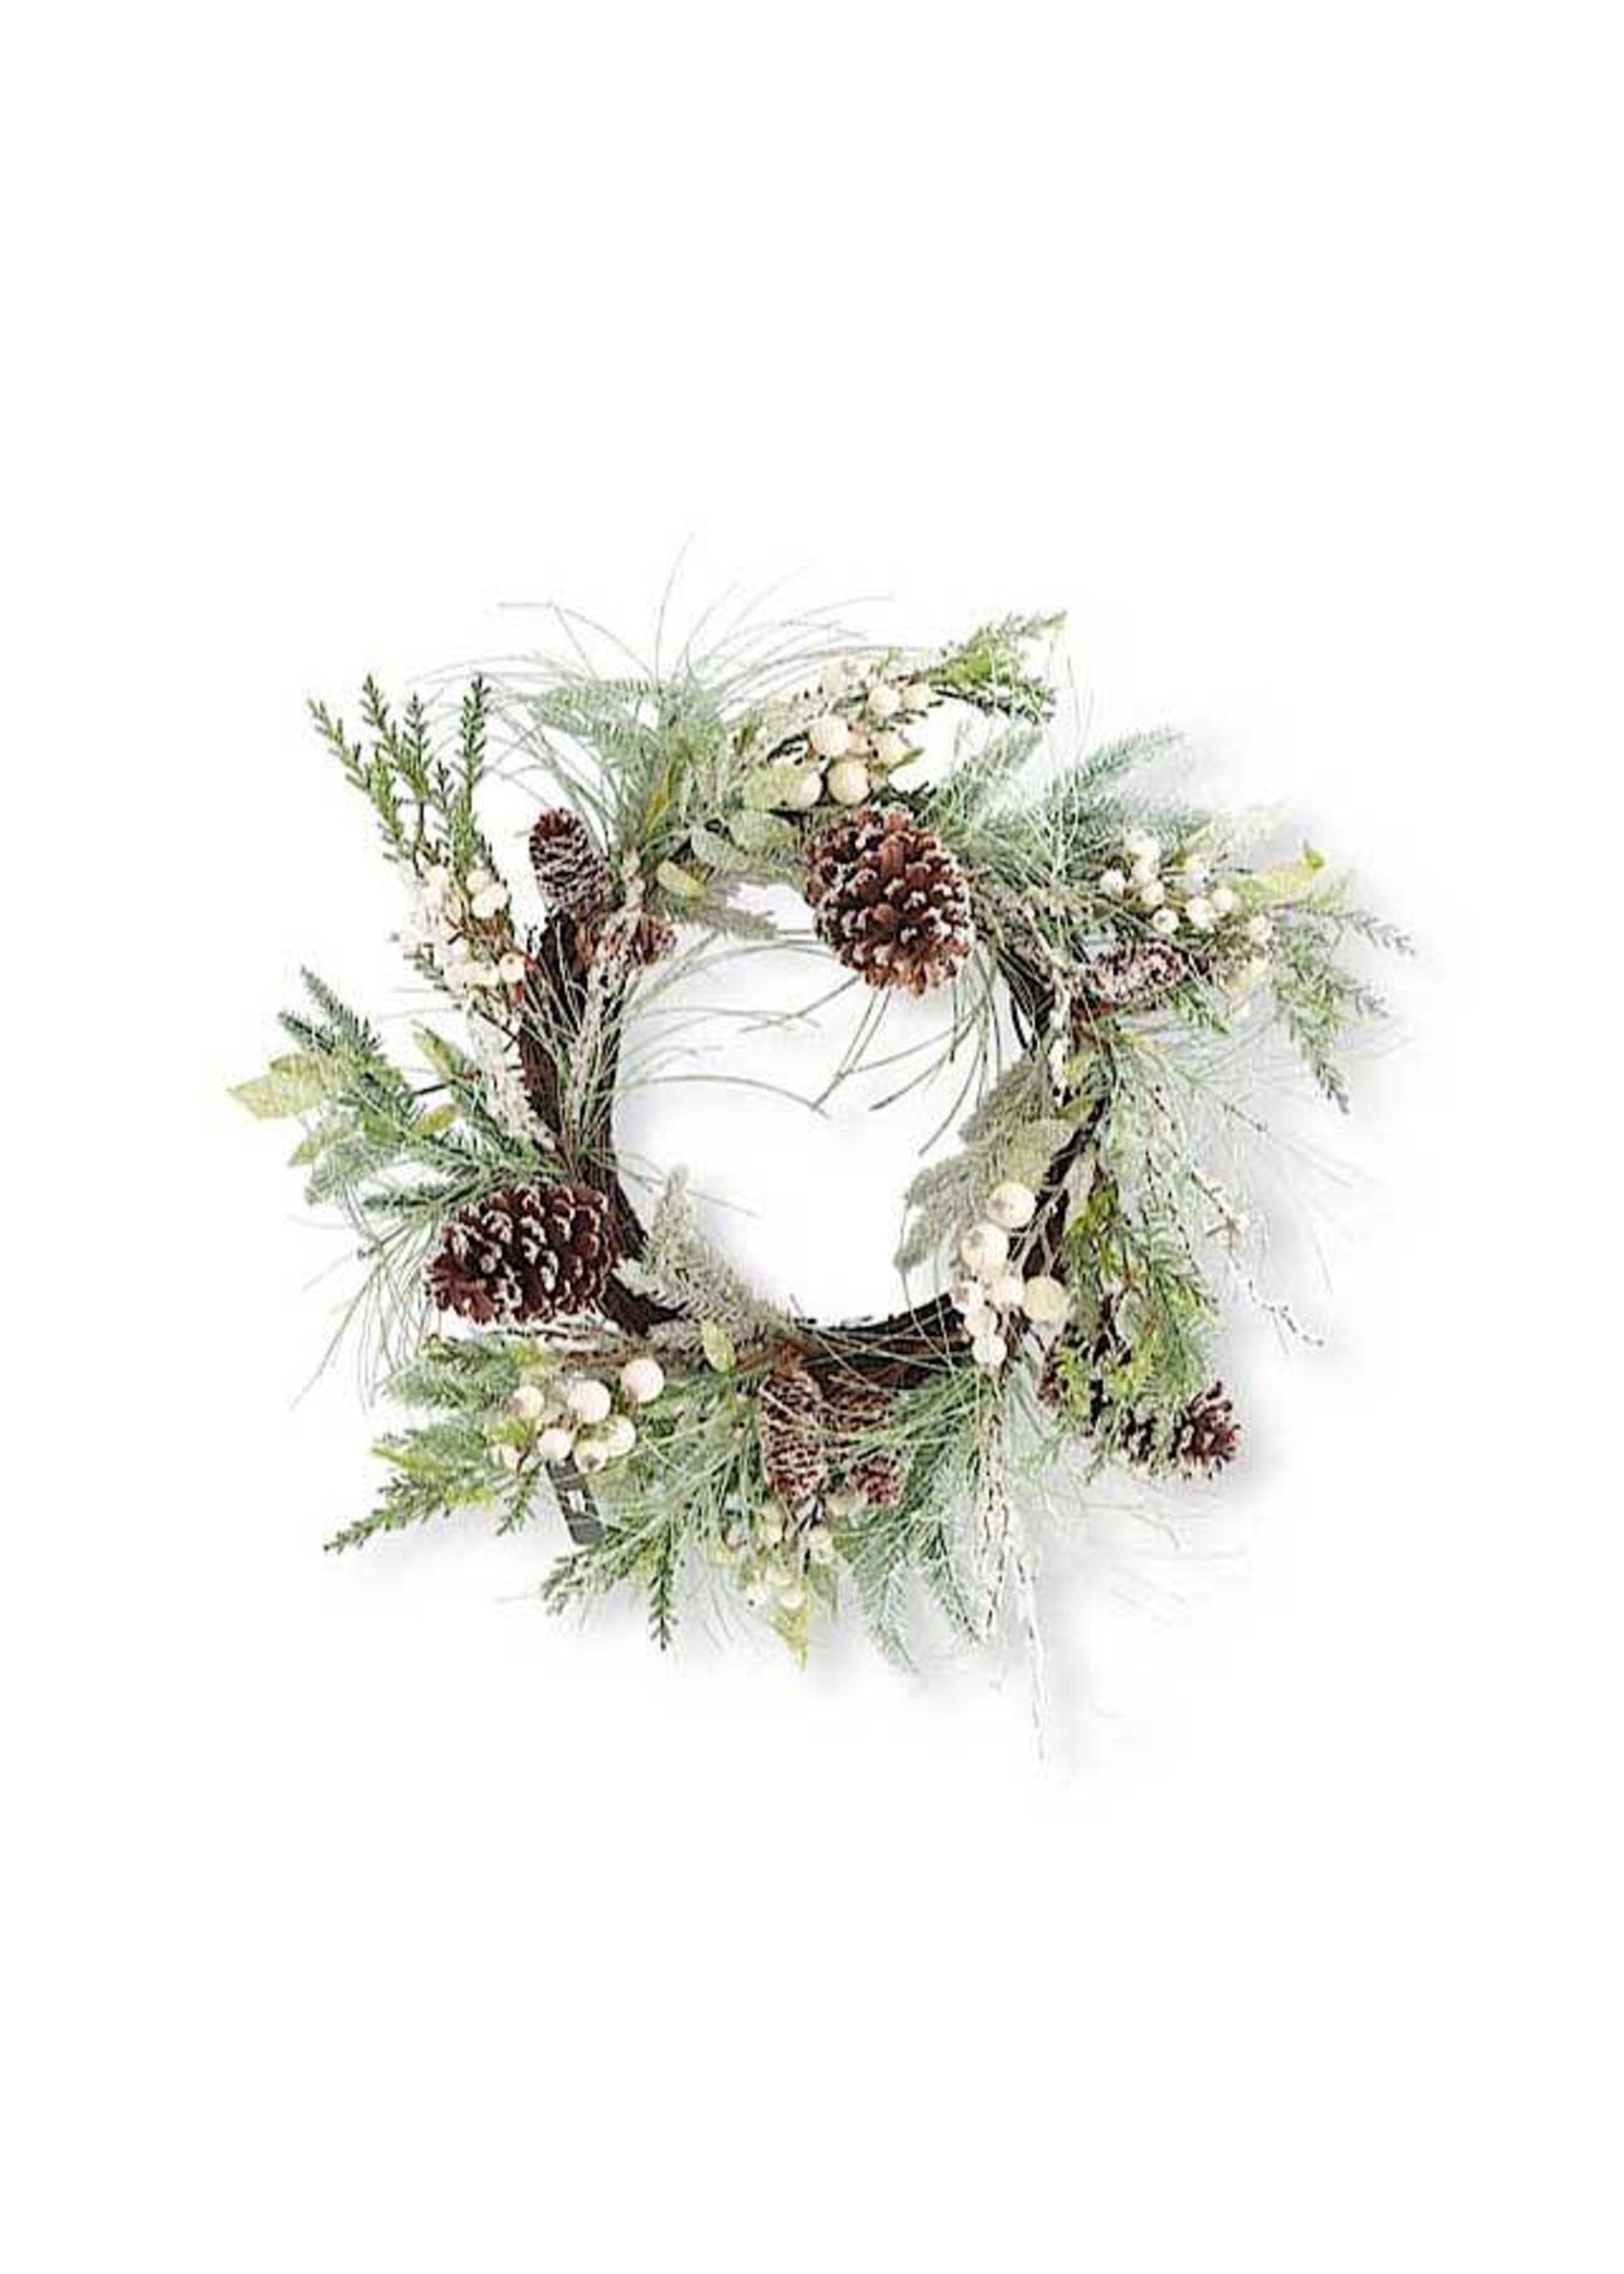 "K & K Interiors 24"" Needle Wreath w/ White Berries"